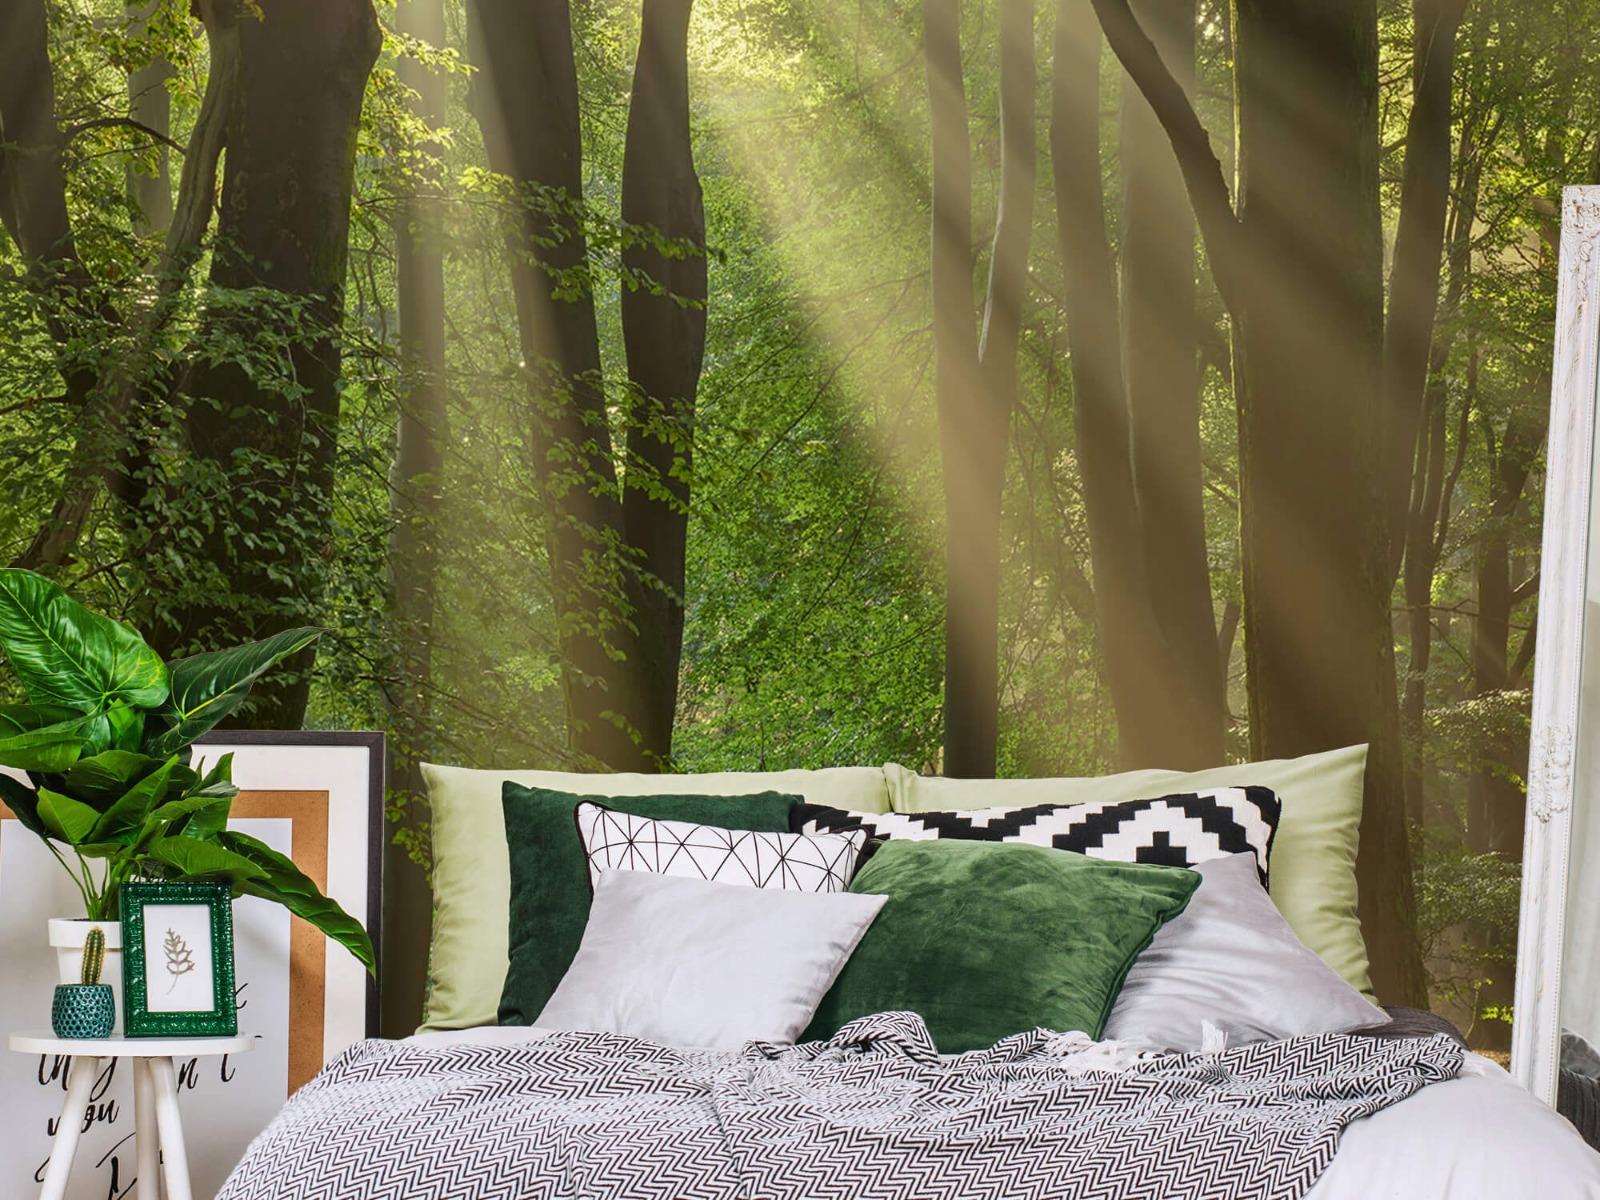 Bomen - Zonneharpen in het bos - Slaapkamer 3